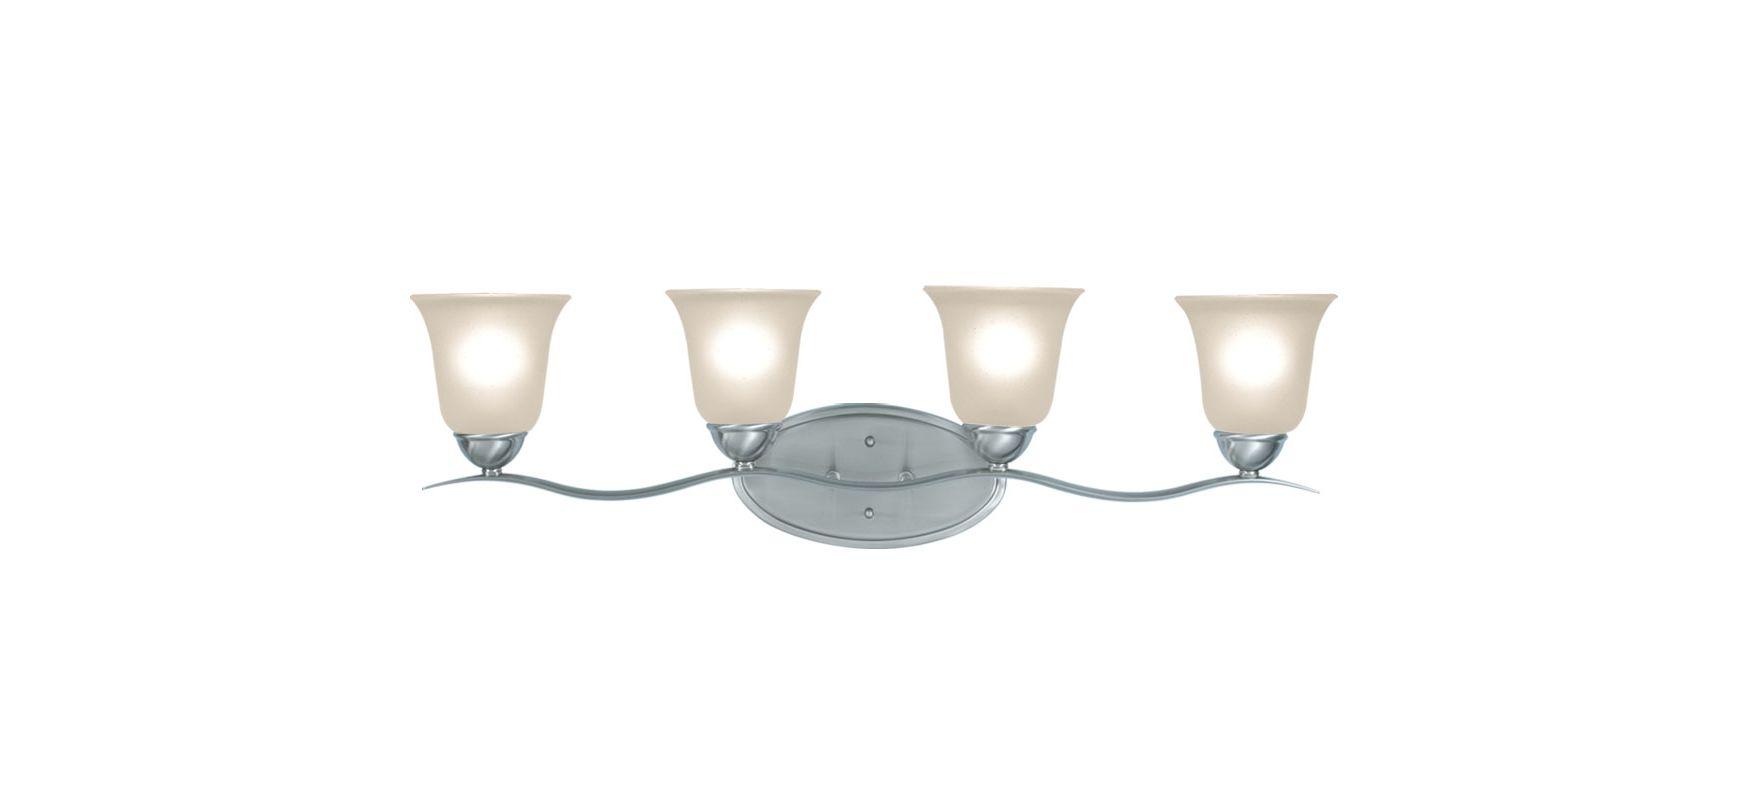 Woodbridge Lighting 50053 Beaconsfield 4 Light Vanity Light Satin